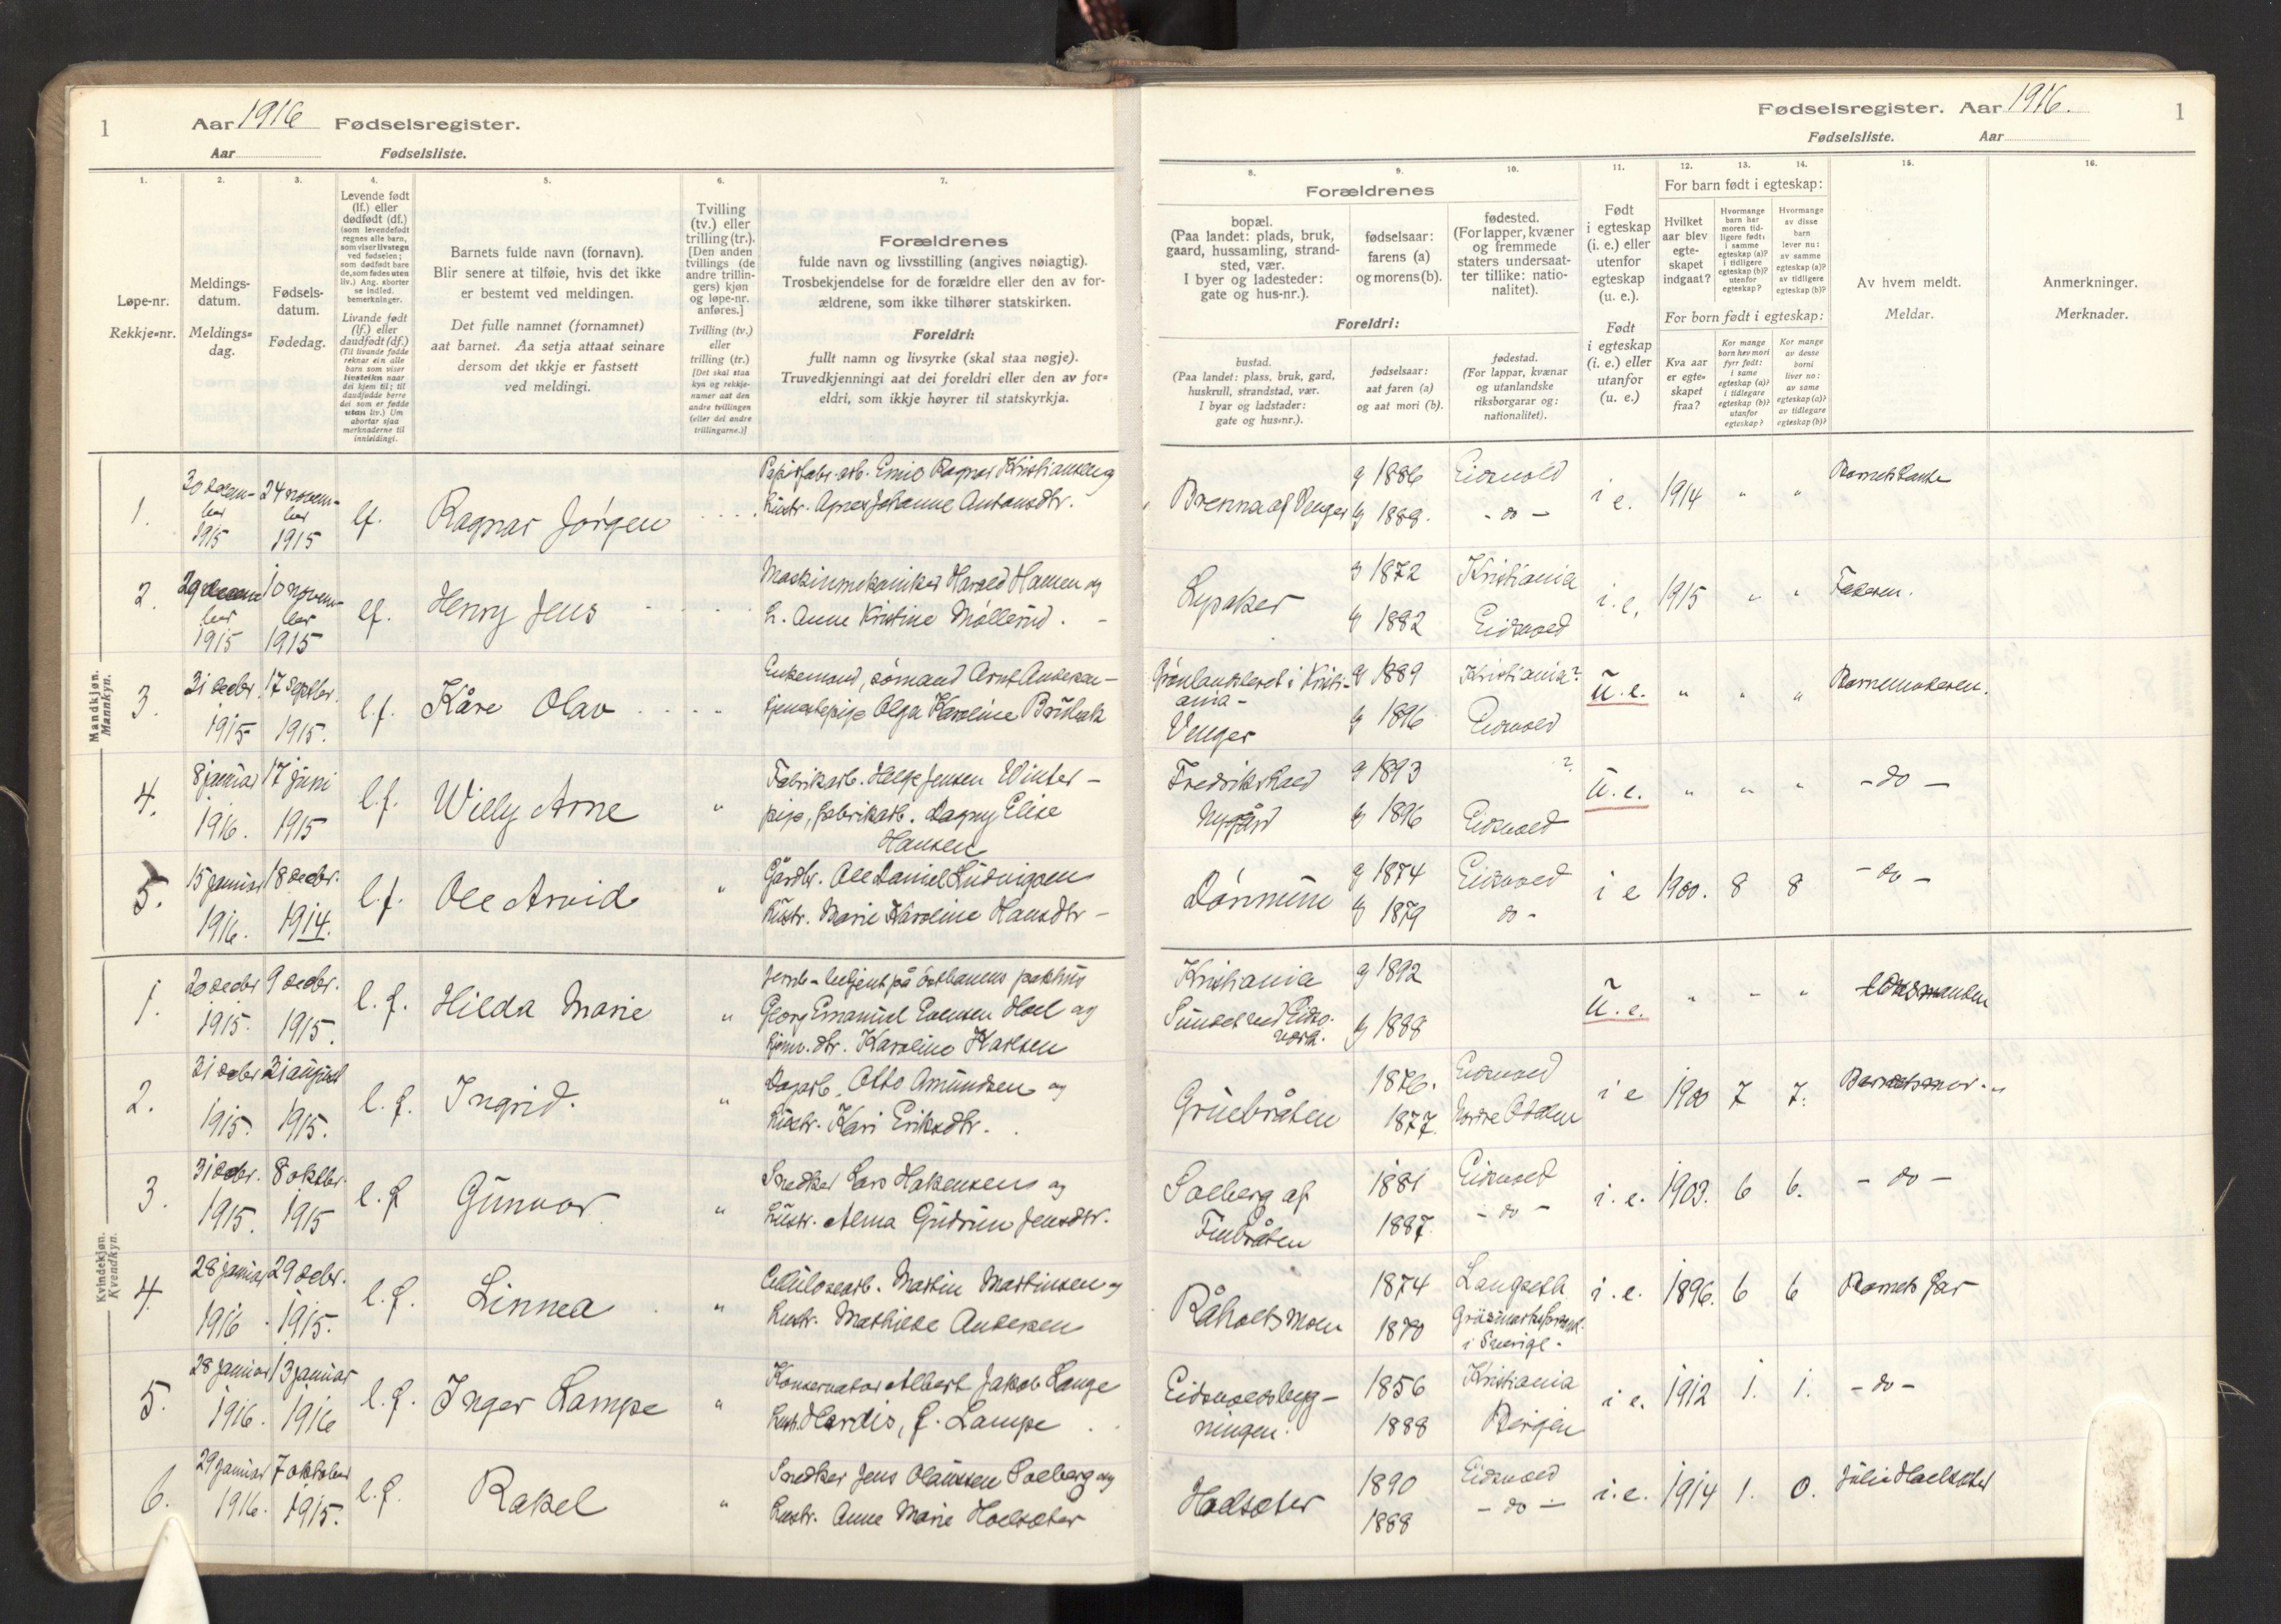 SAO, Eidsvoll prestekontor Kirkebøker, Birth register no. I 1, 1916-1924, p. 1